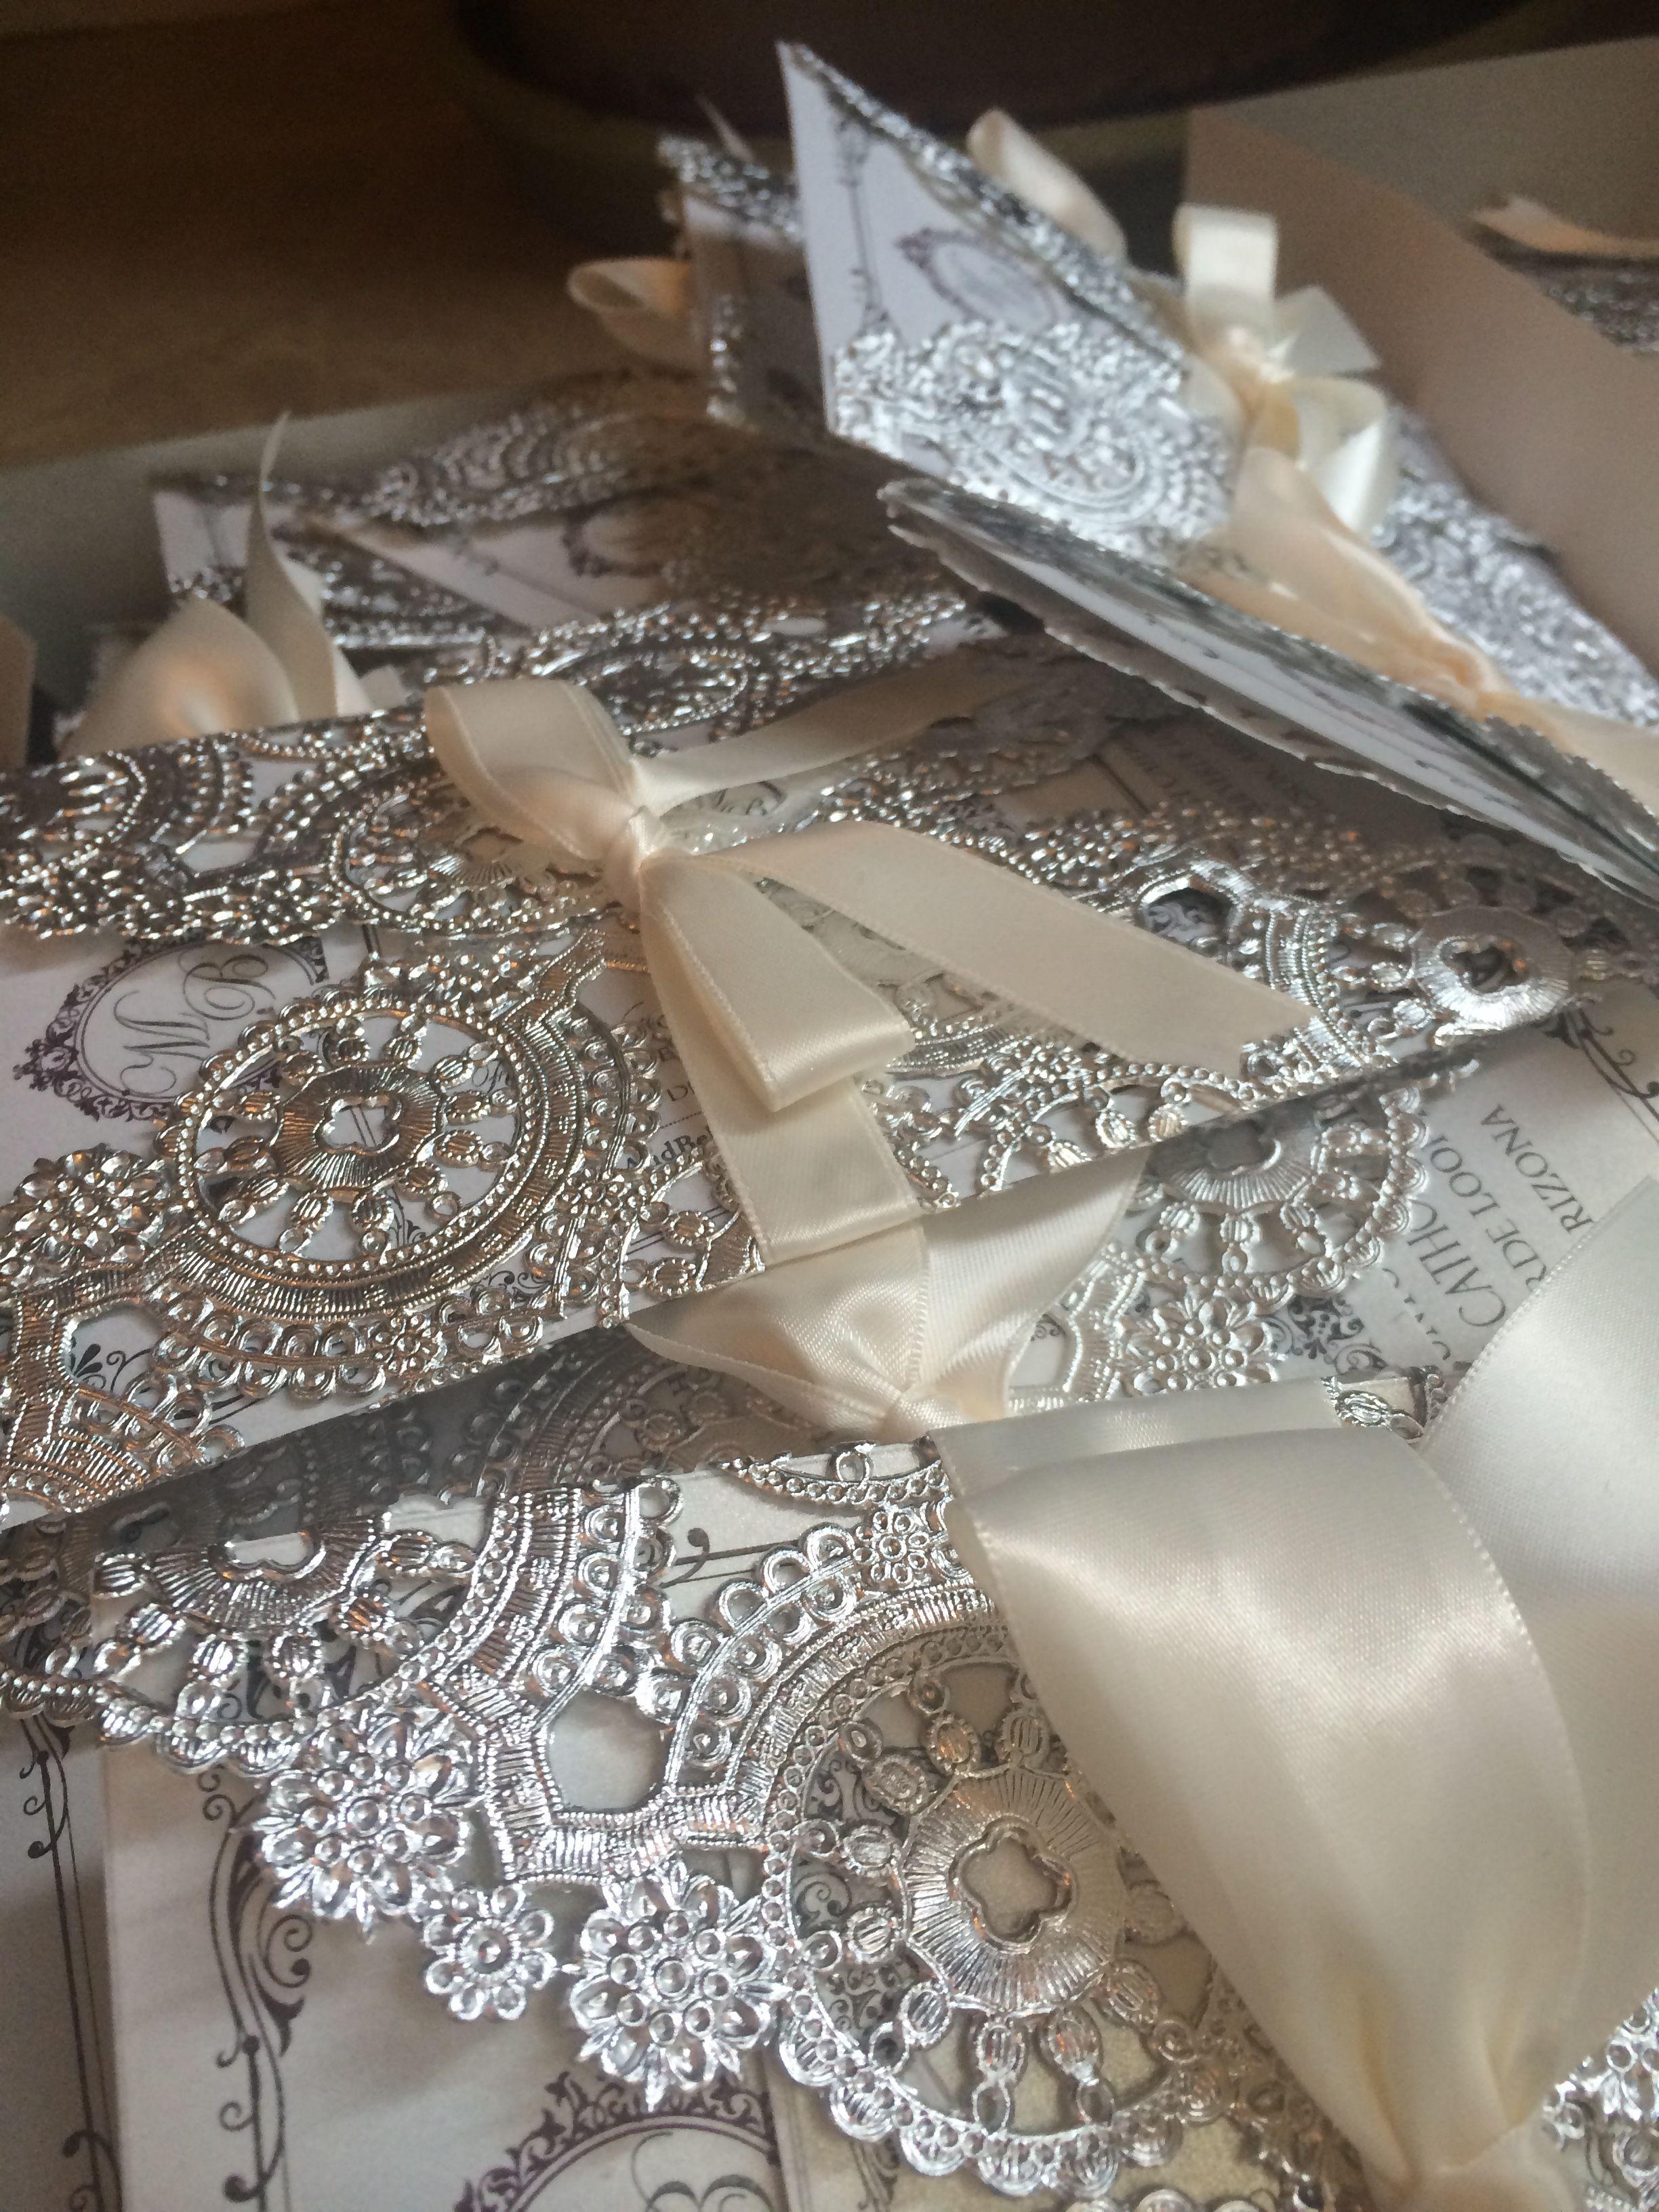 Customized Diy Wedding Invitations Metallic Doilies Pearl Gold Shimmer Paper Custom Emblem Satin Ribbon Champagne Envelopes Winter